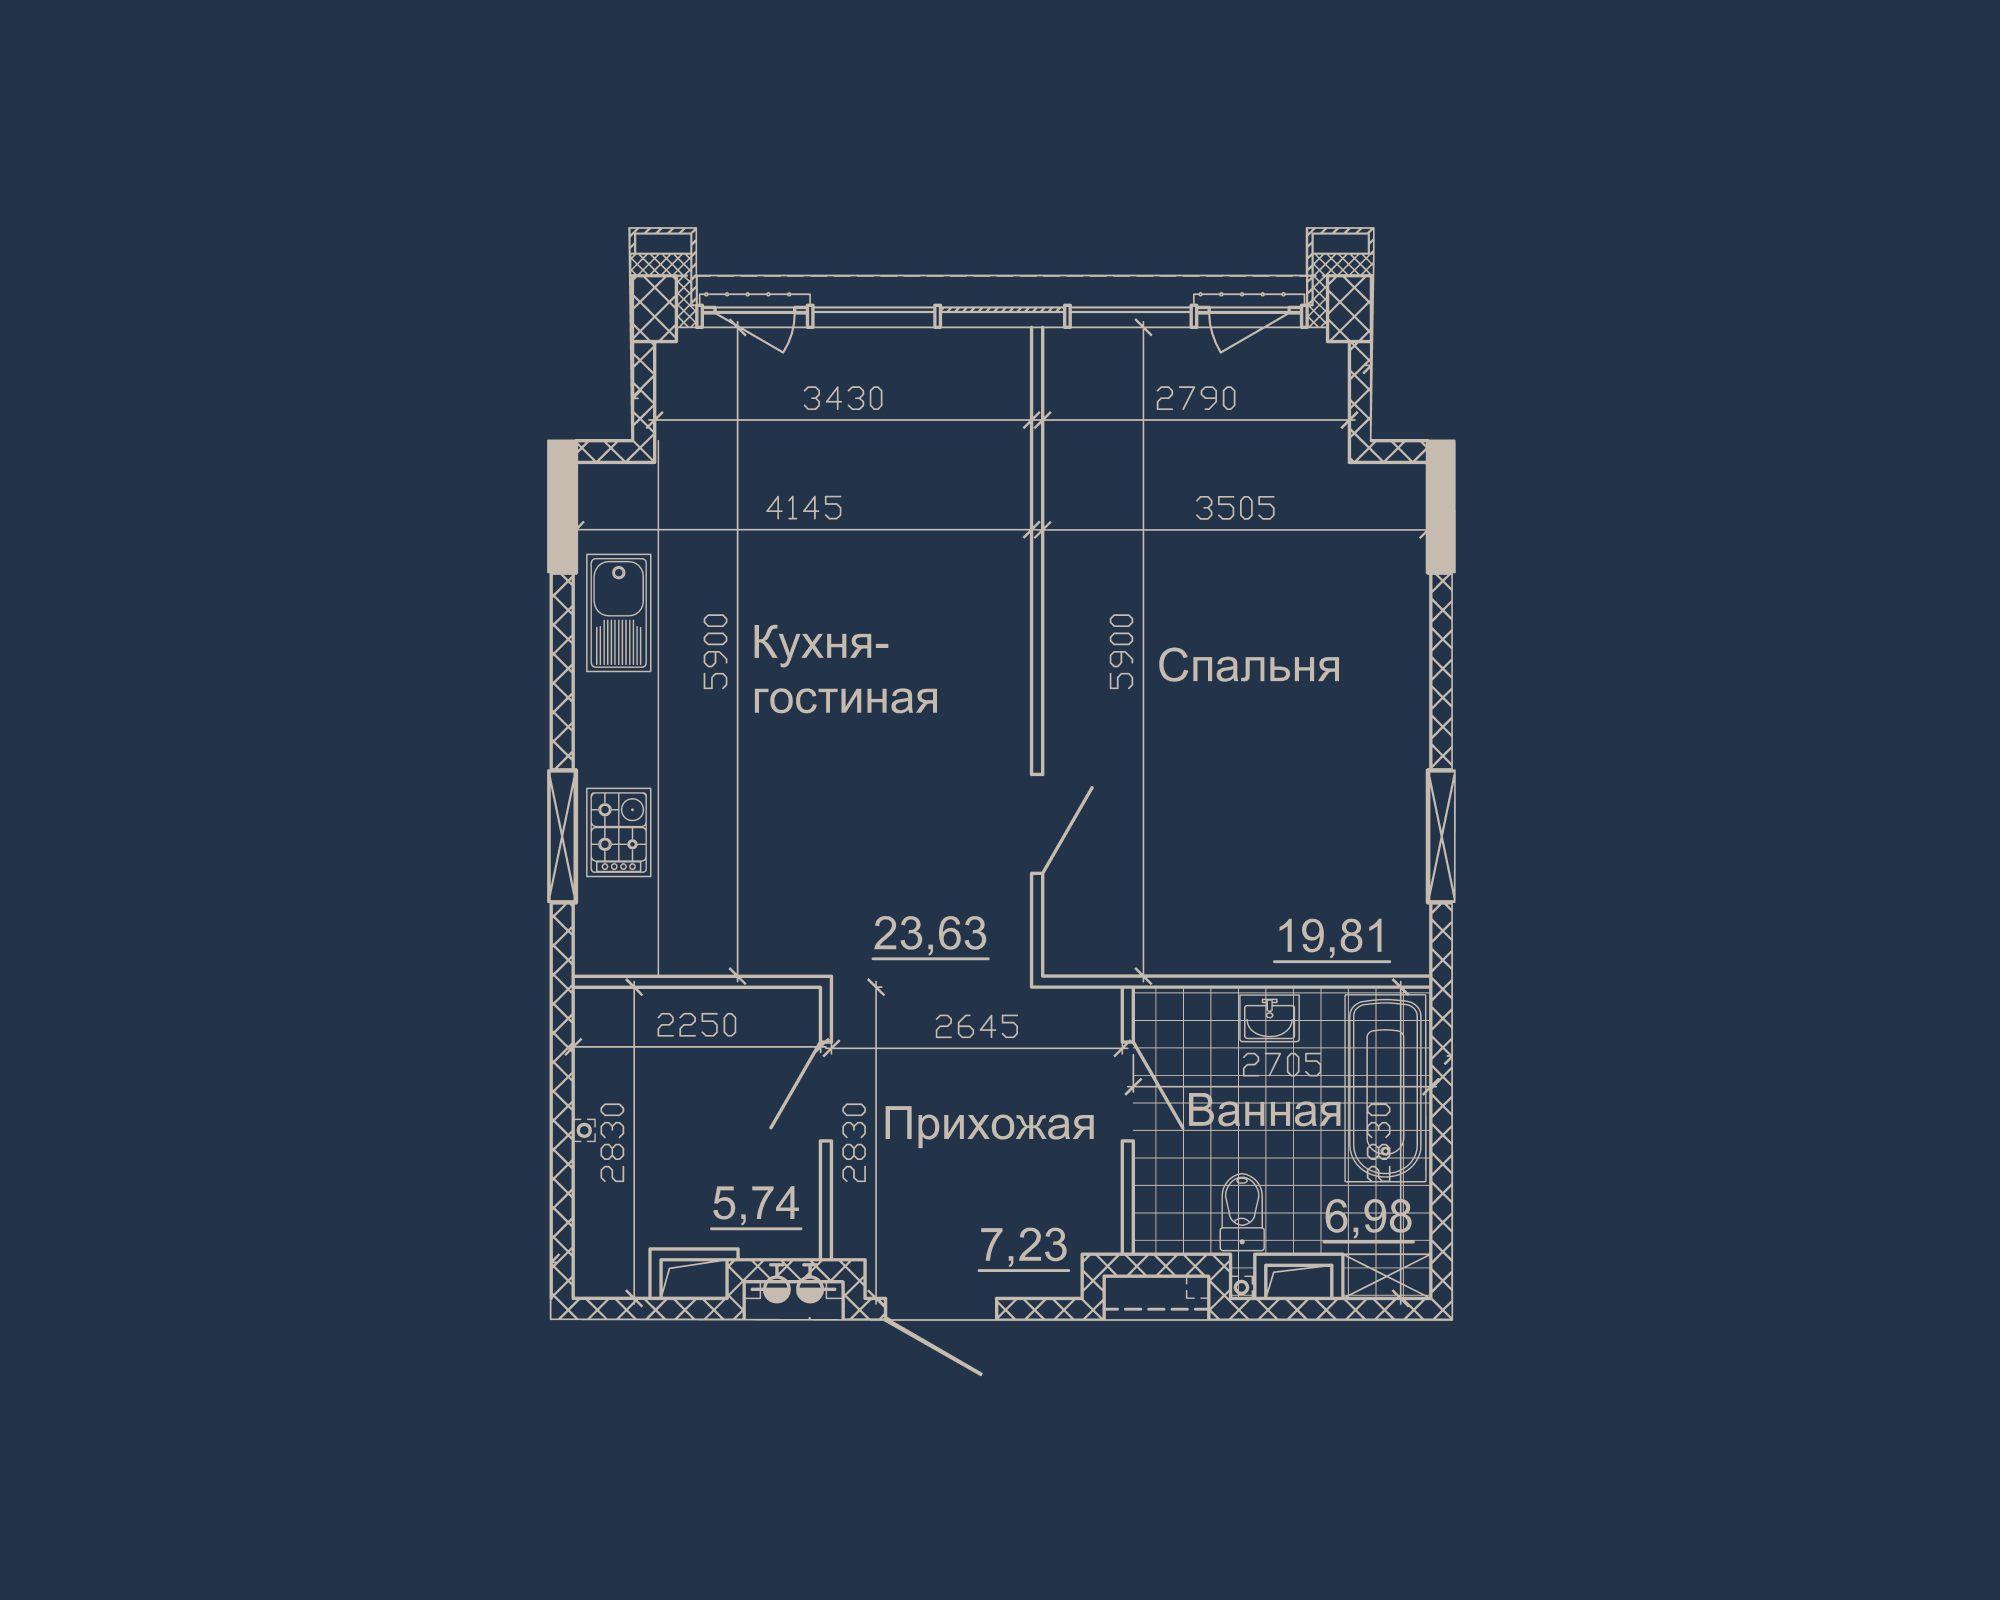 1-кімнатна квартира типу 02А у ЖК Nebo